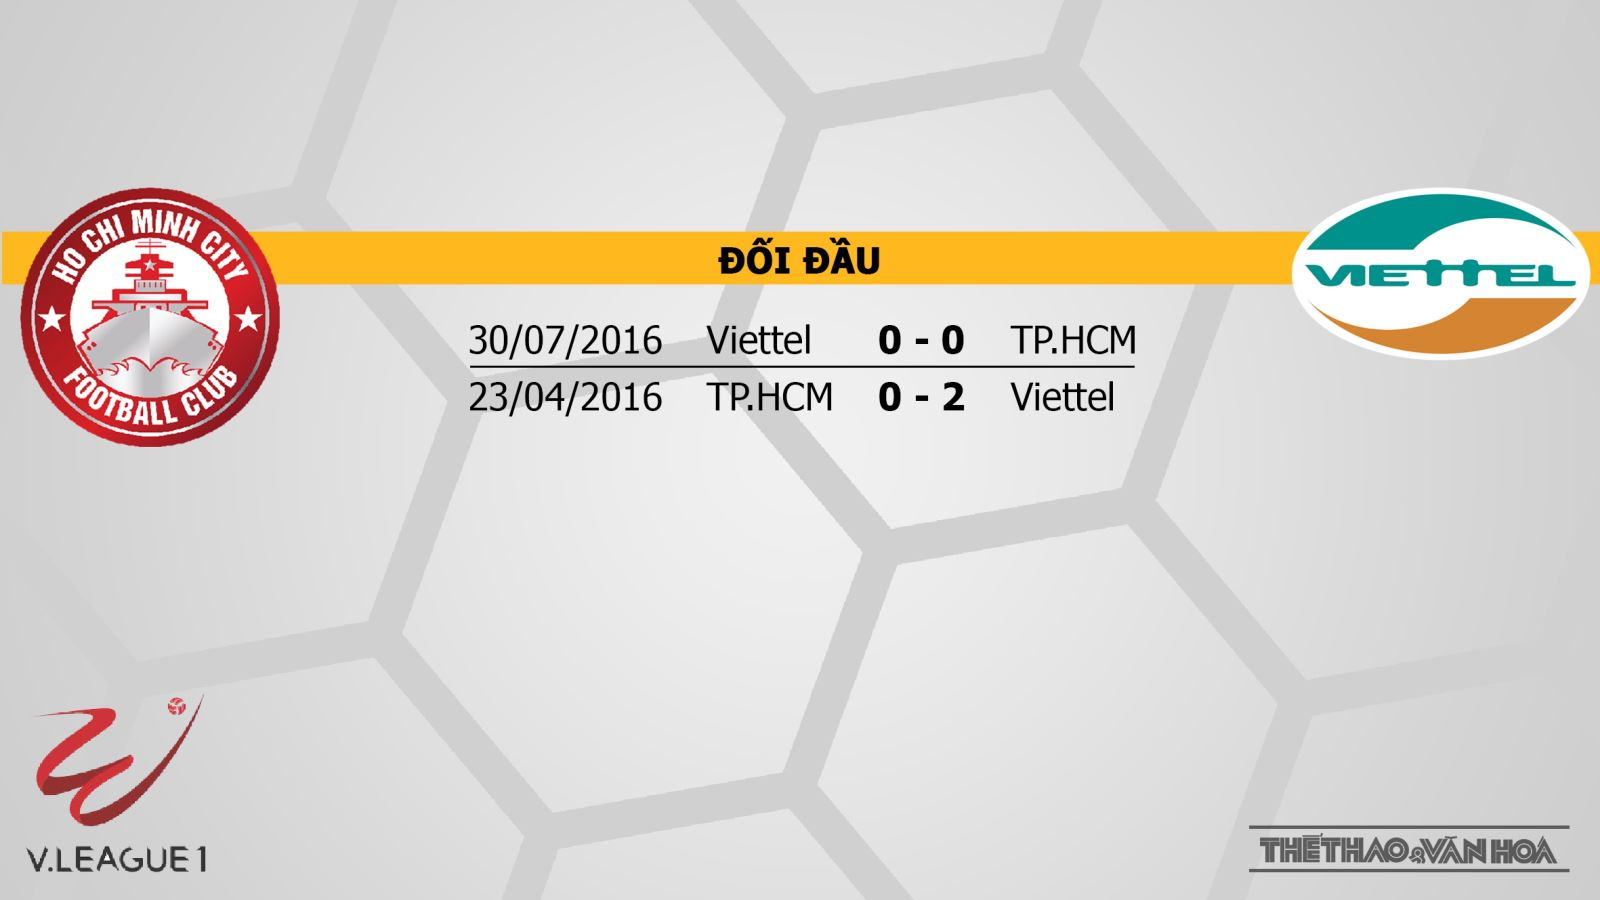 FPT Play, TPHCM vs Viettel, truc tiep bong da, trực tiếp bóng đá, TPHCM, Viettel, VLeague 2019, xem bong da truc tuyen, FPT, trực tiếp TPHCM vs Viettel